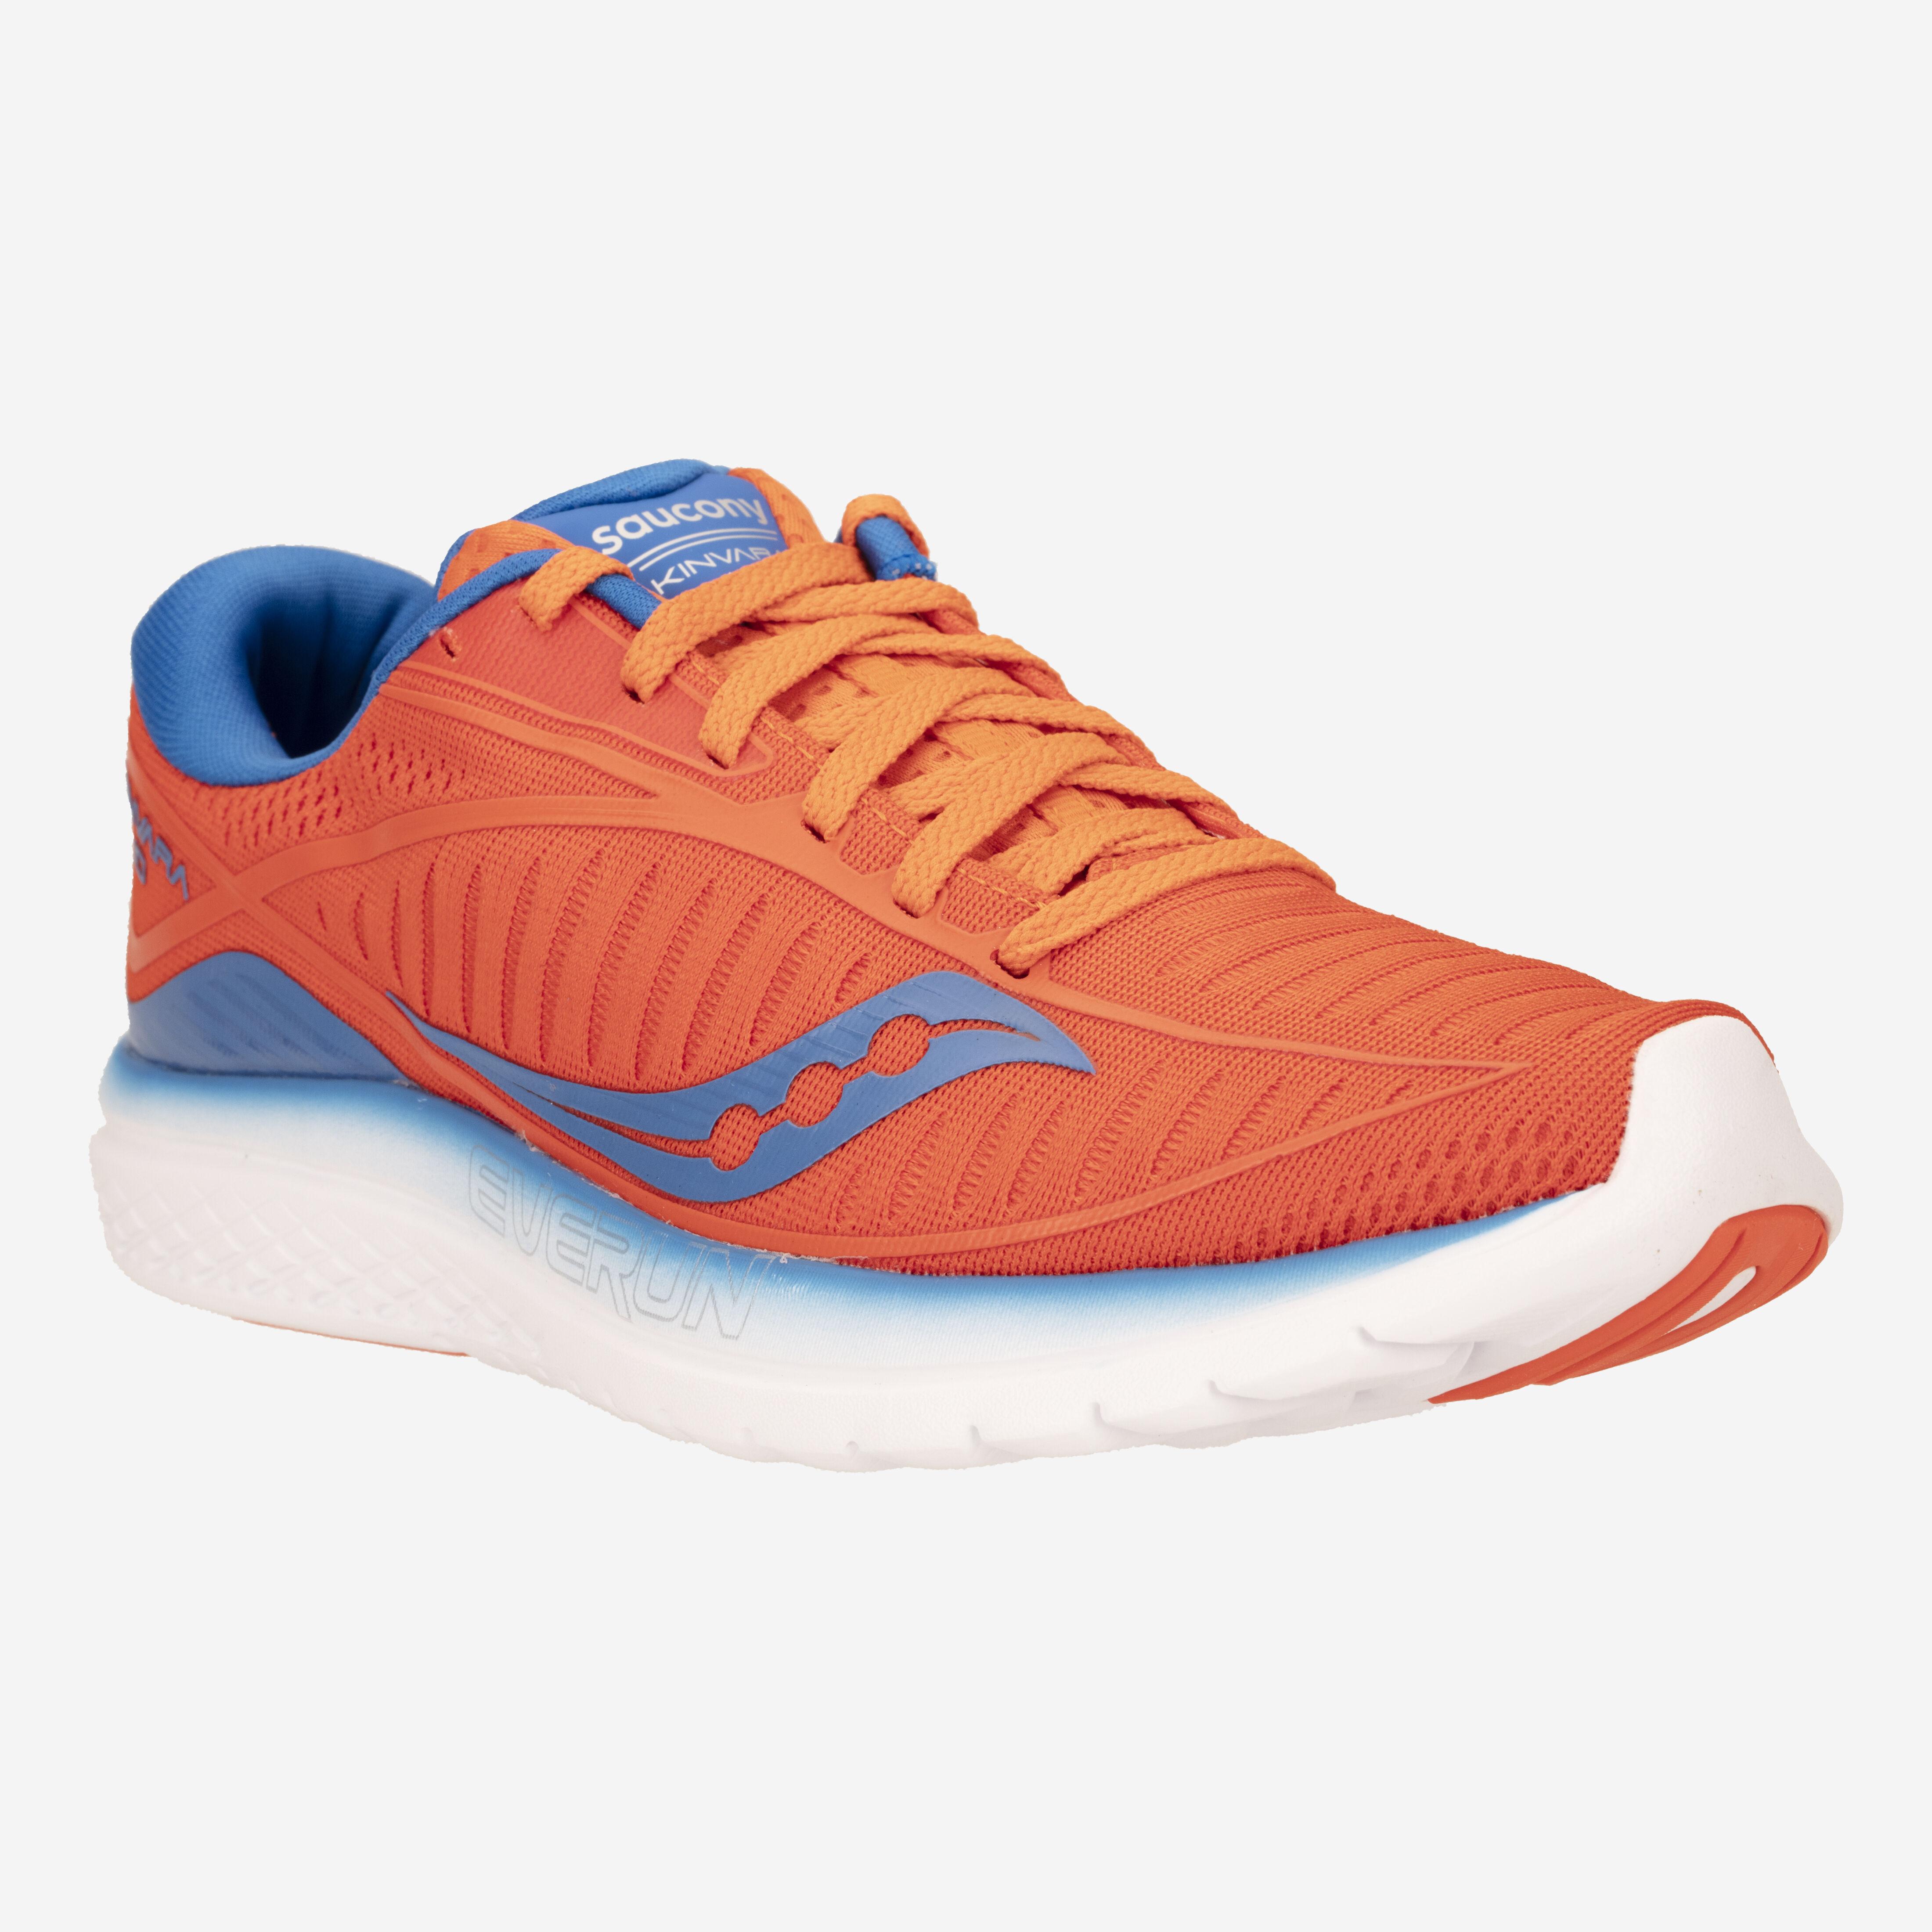 saucony kinvara 8 precio orange rd